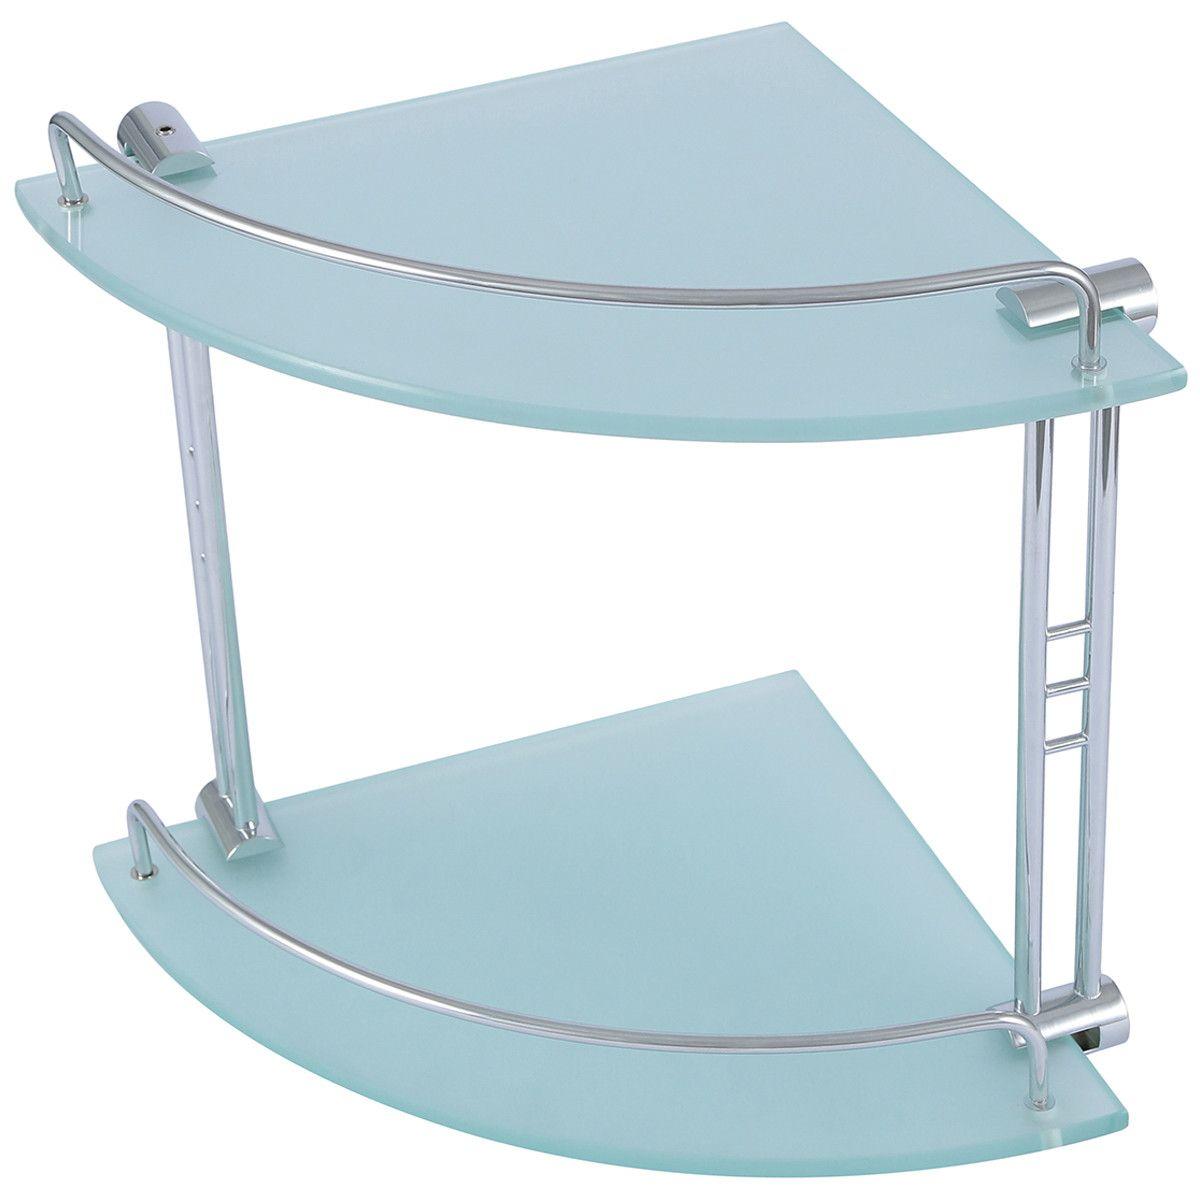 Linisi 3-Tier Glass Bathroom Rack  #dubai #home #dubaidesign #homedecor #homefurnishings #dubailife #homeimprovement #furniture #unitedarabemirates #onlineshopping